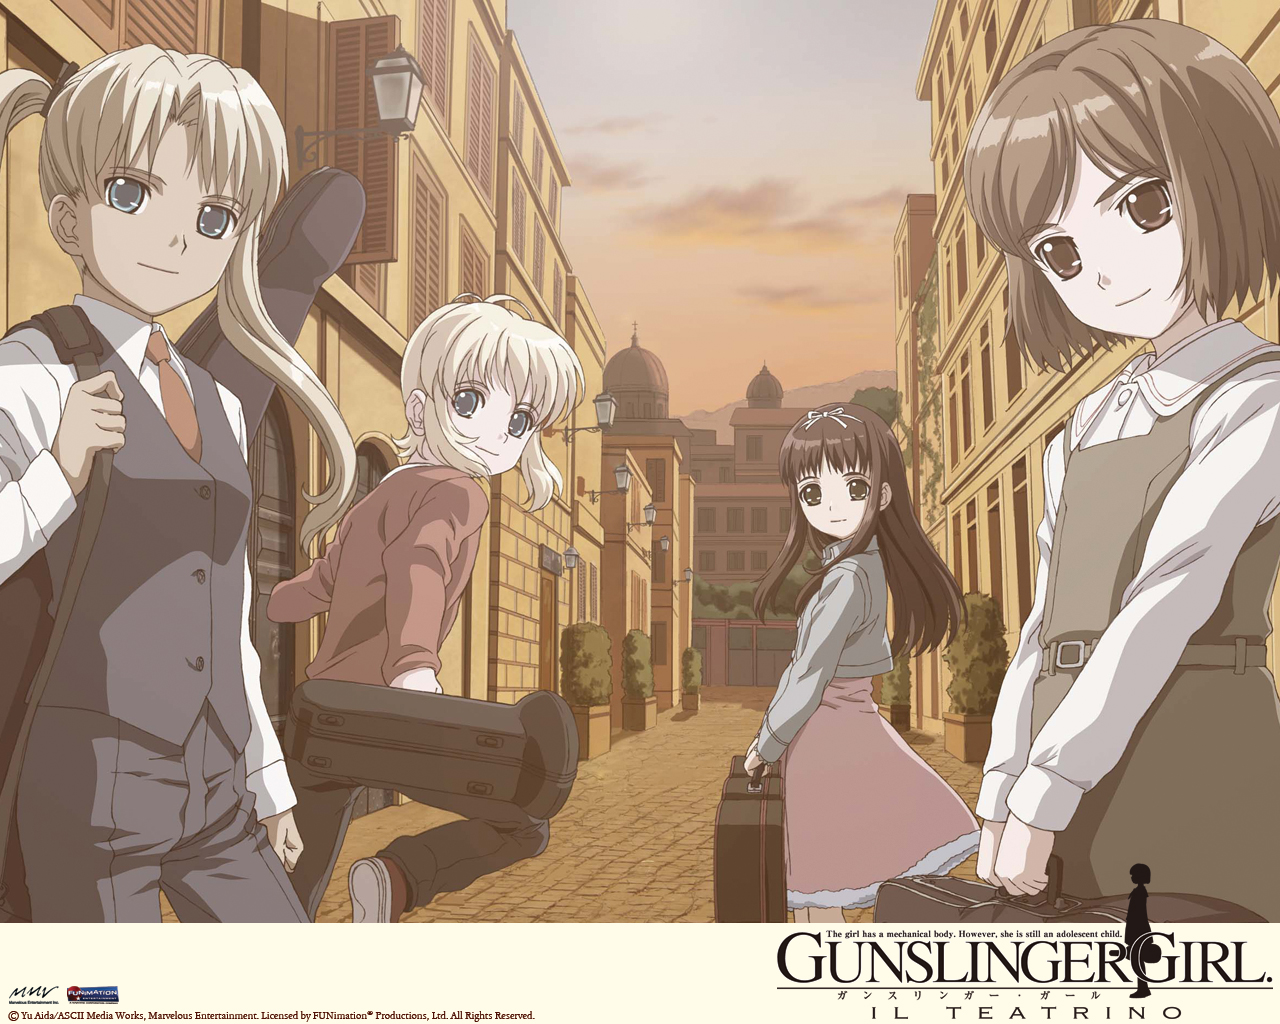 Nice Images Collection: Gunslinger Girl Il Teatrino Desktop Wallpapers